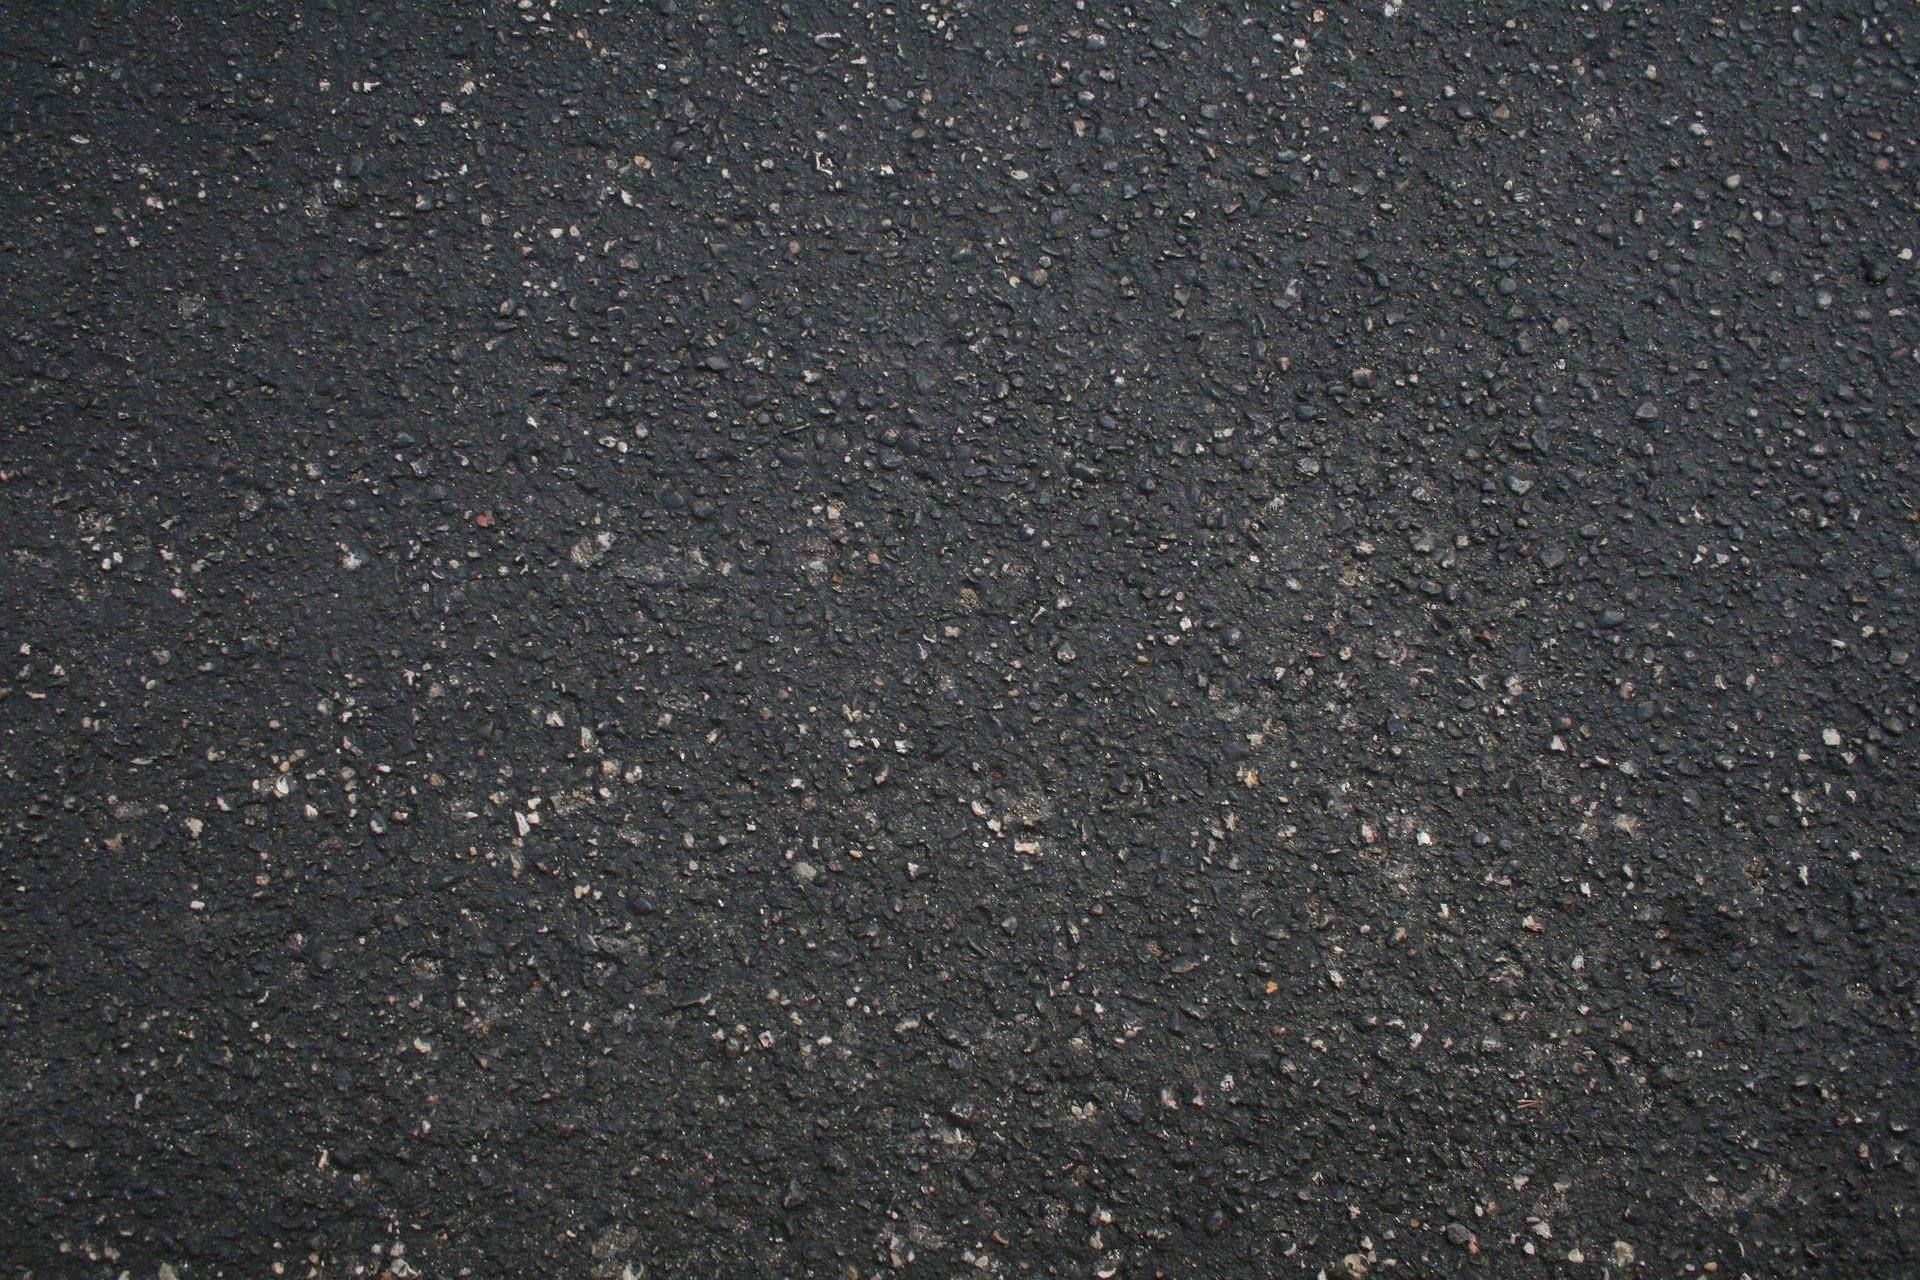 pavement-2313860_1920